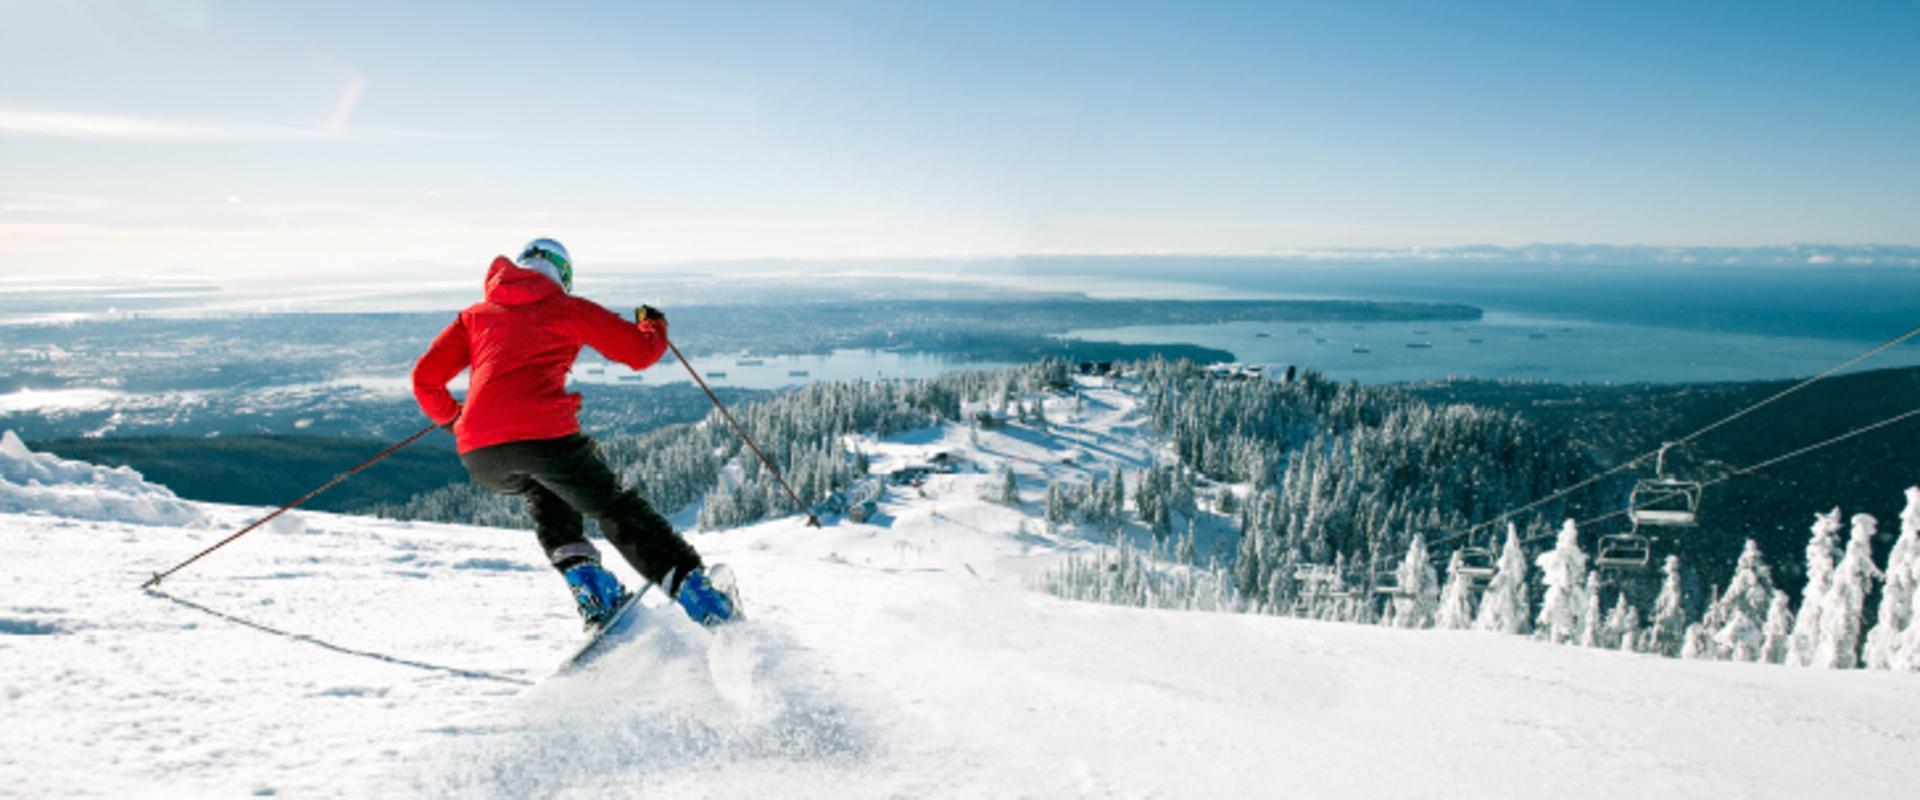 grouse-mountain-skiiing